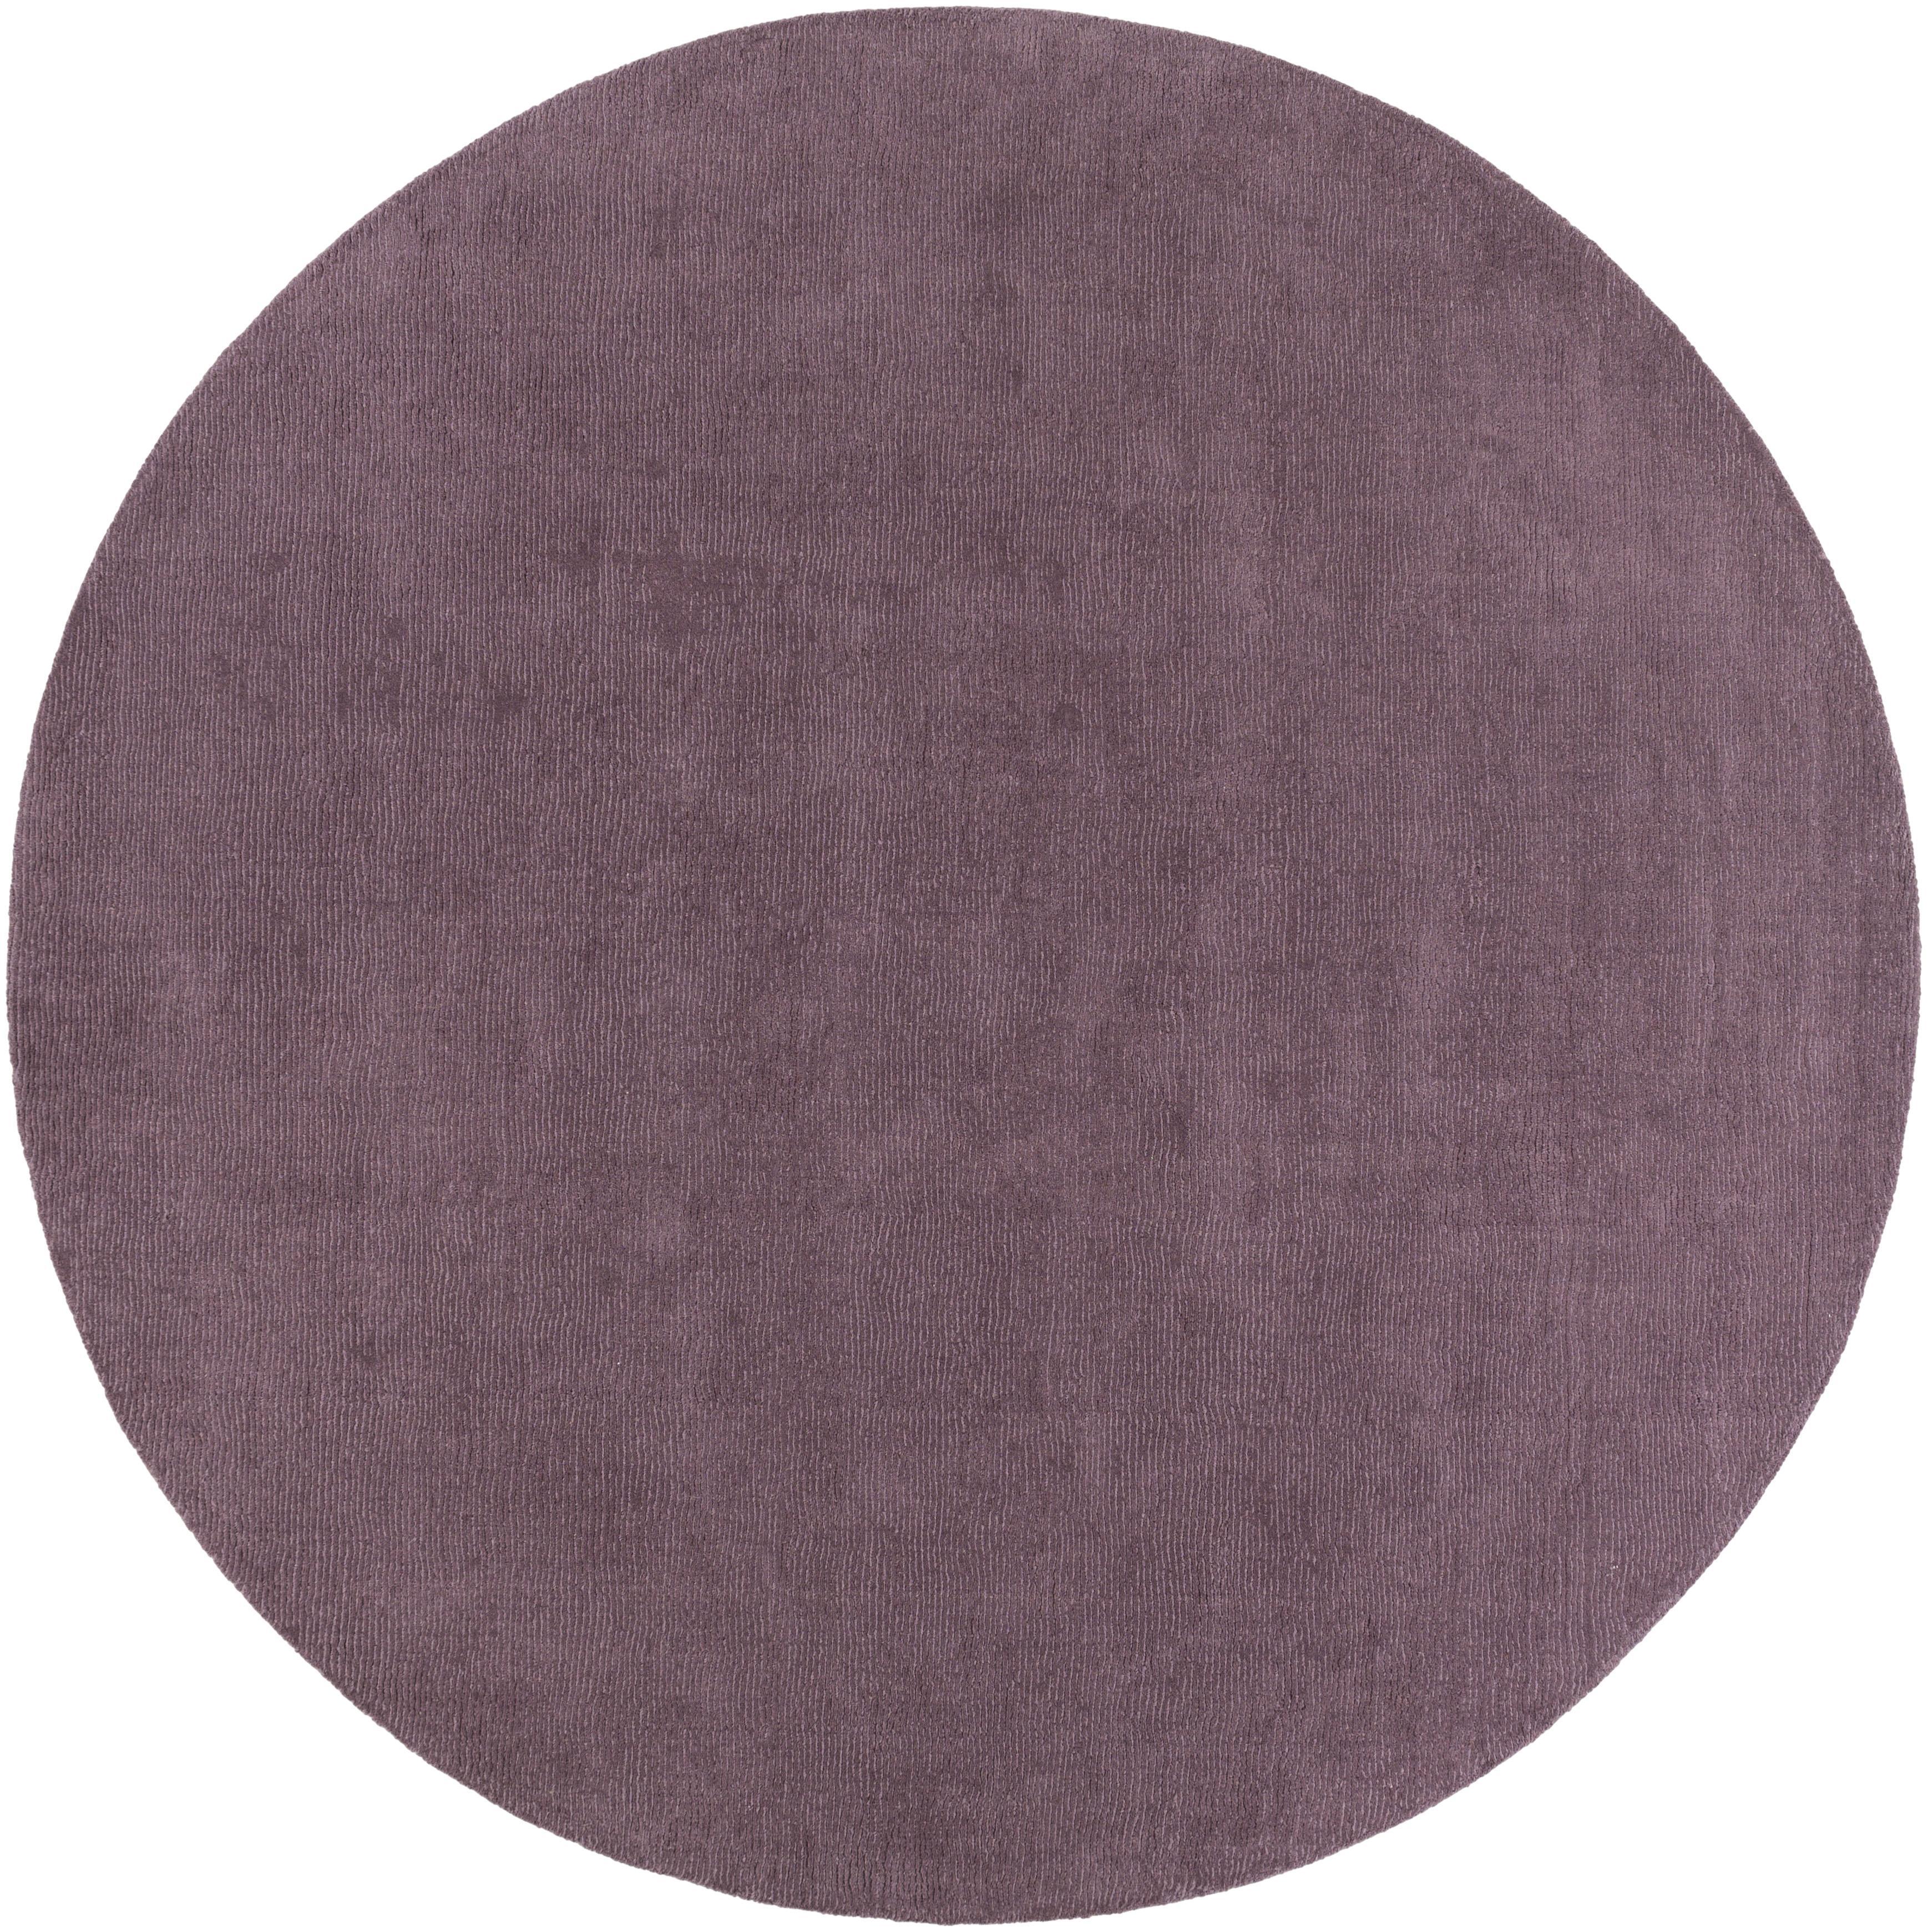 Surya Rugs Mystique 8' Round - Item Number: M5329-8RD